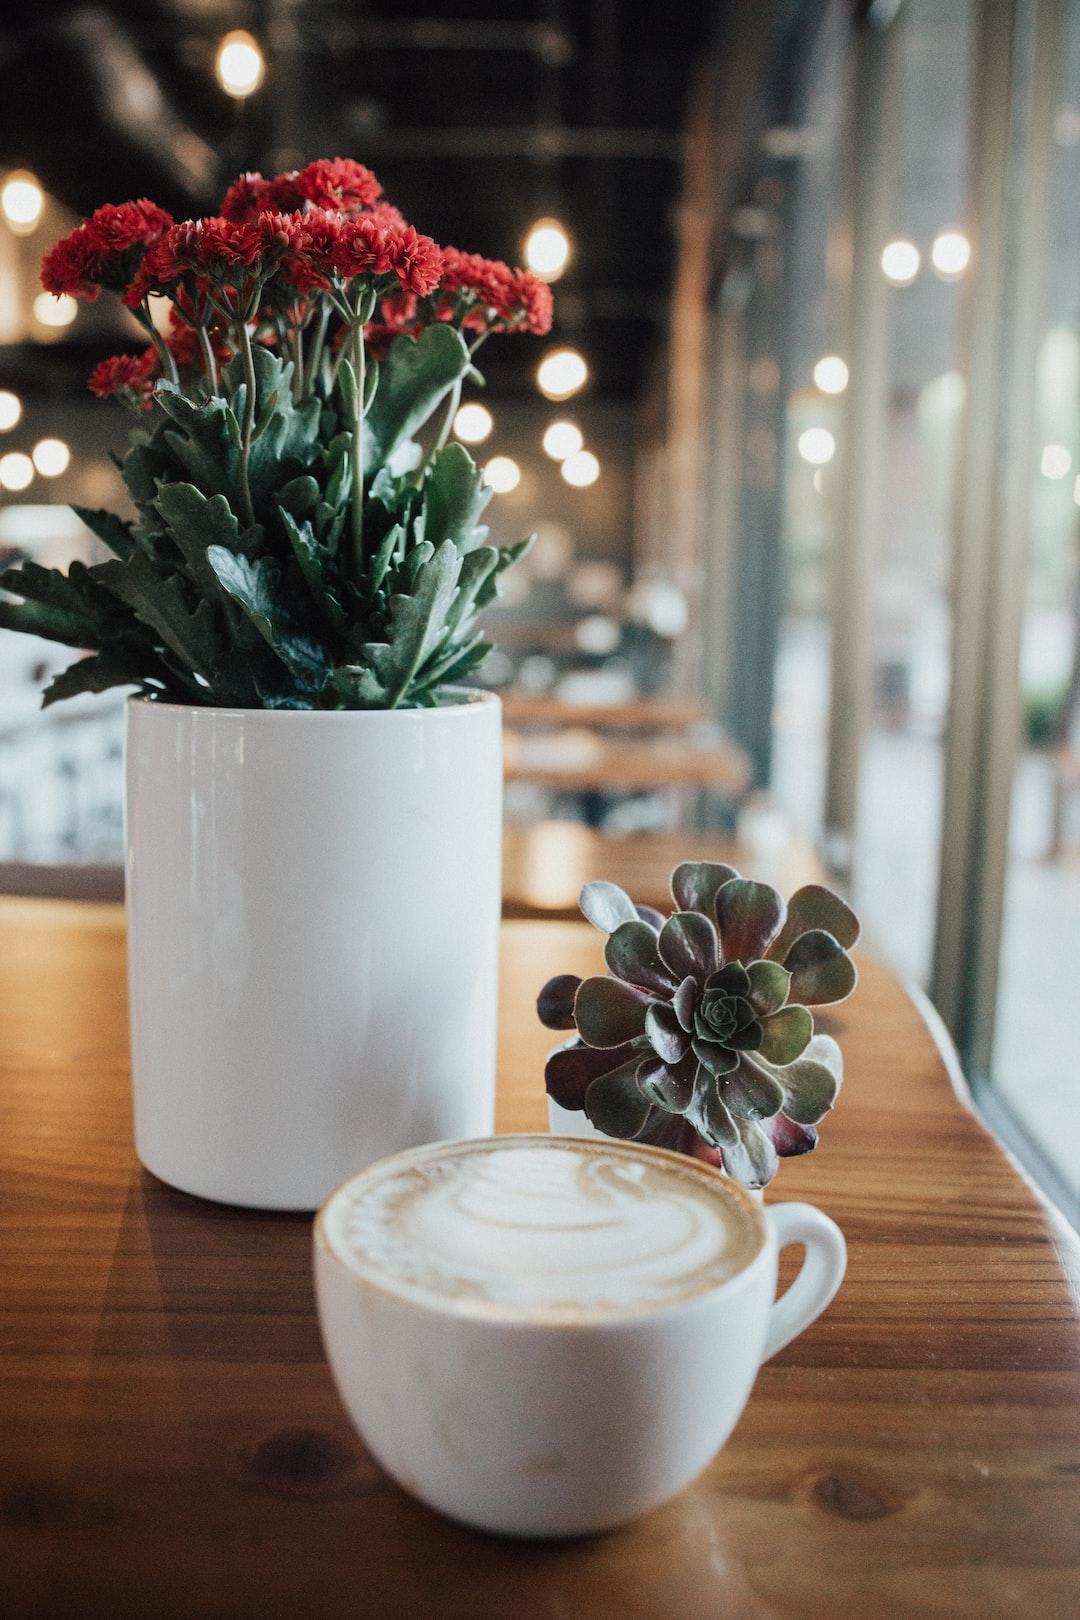 White Ceramic Mug Beside White Ceramic Flower Vase With Green Plant Photo Free Cup Image On Unsplash